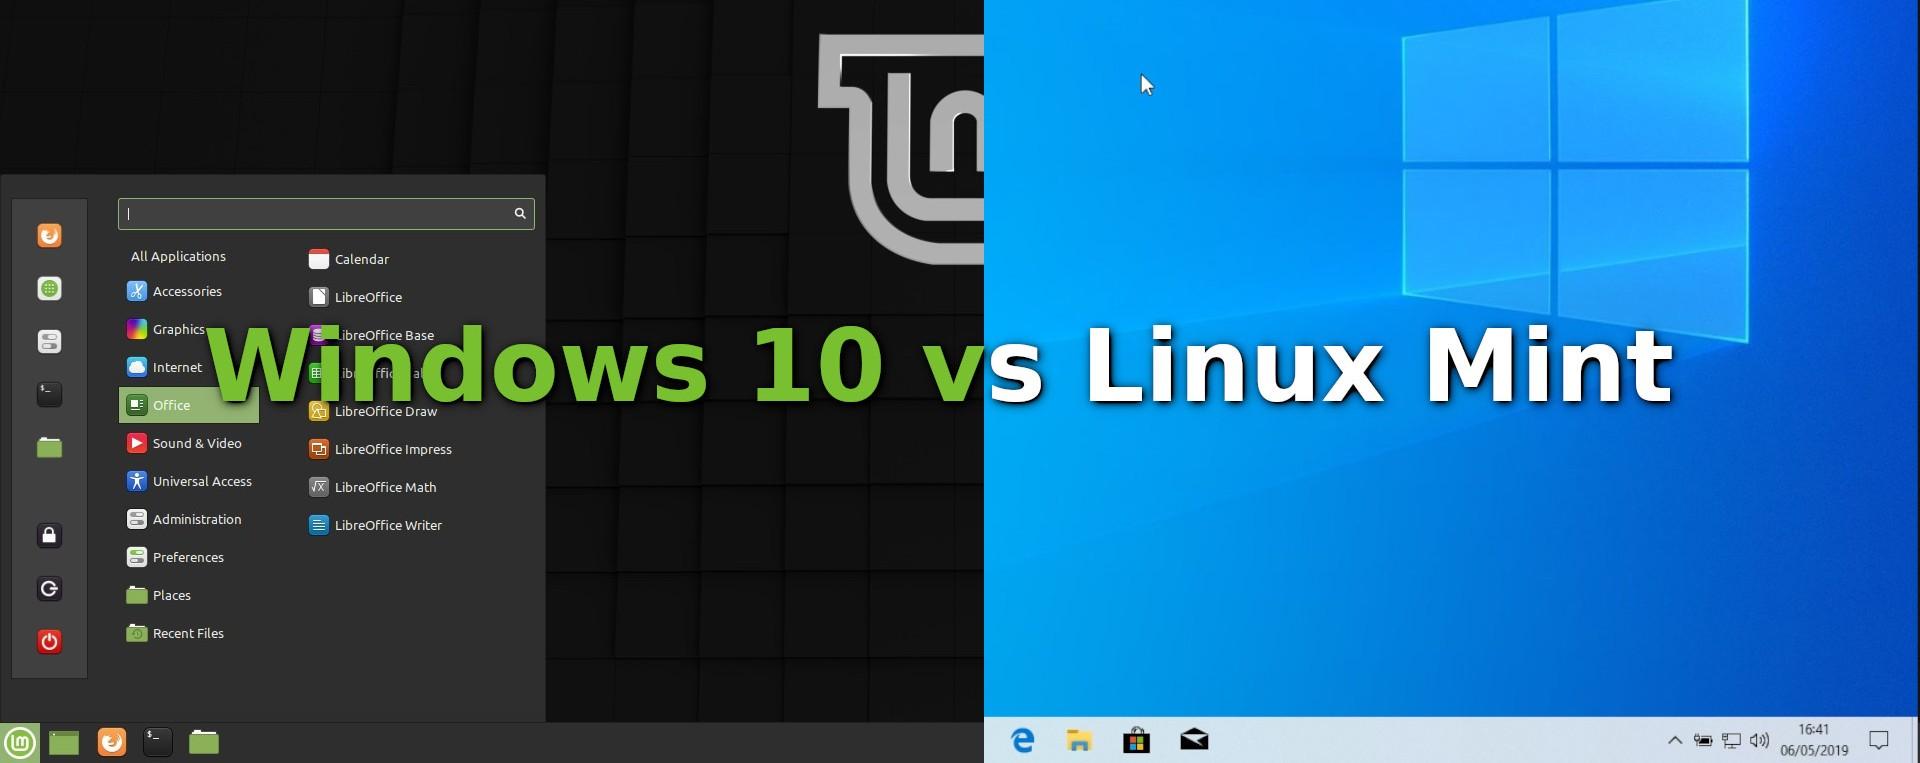 Windows 10 vs Linux Mint